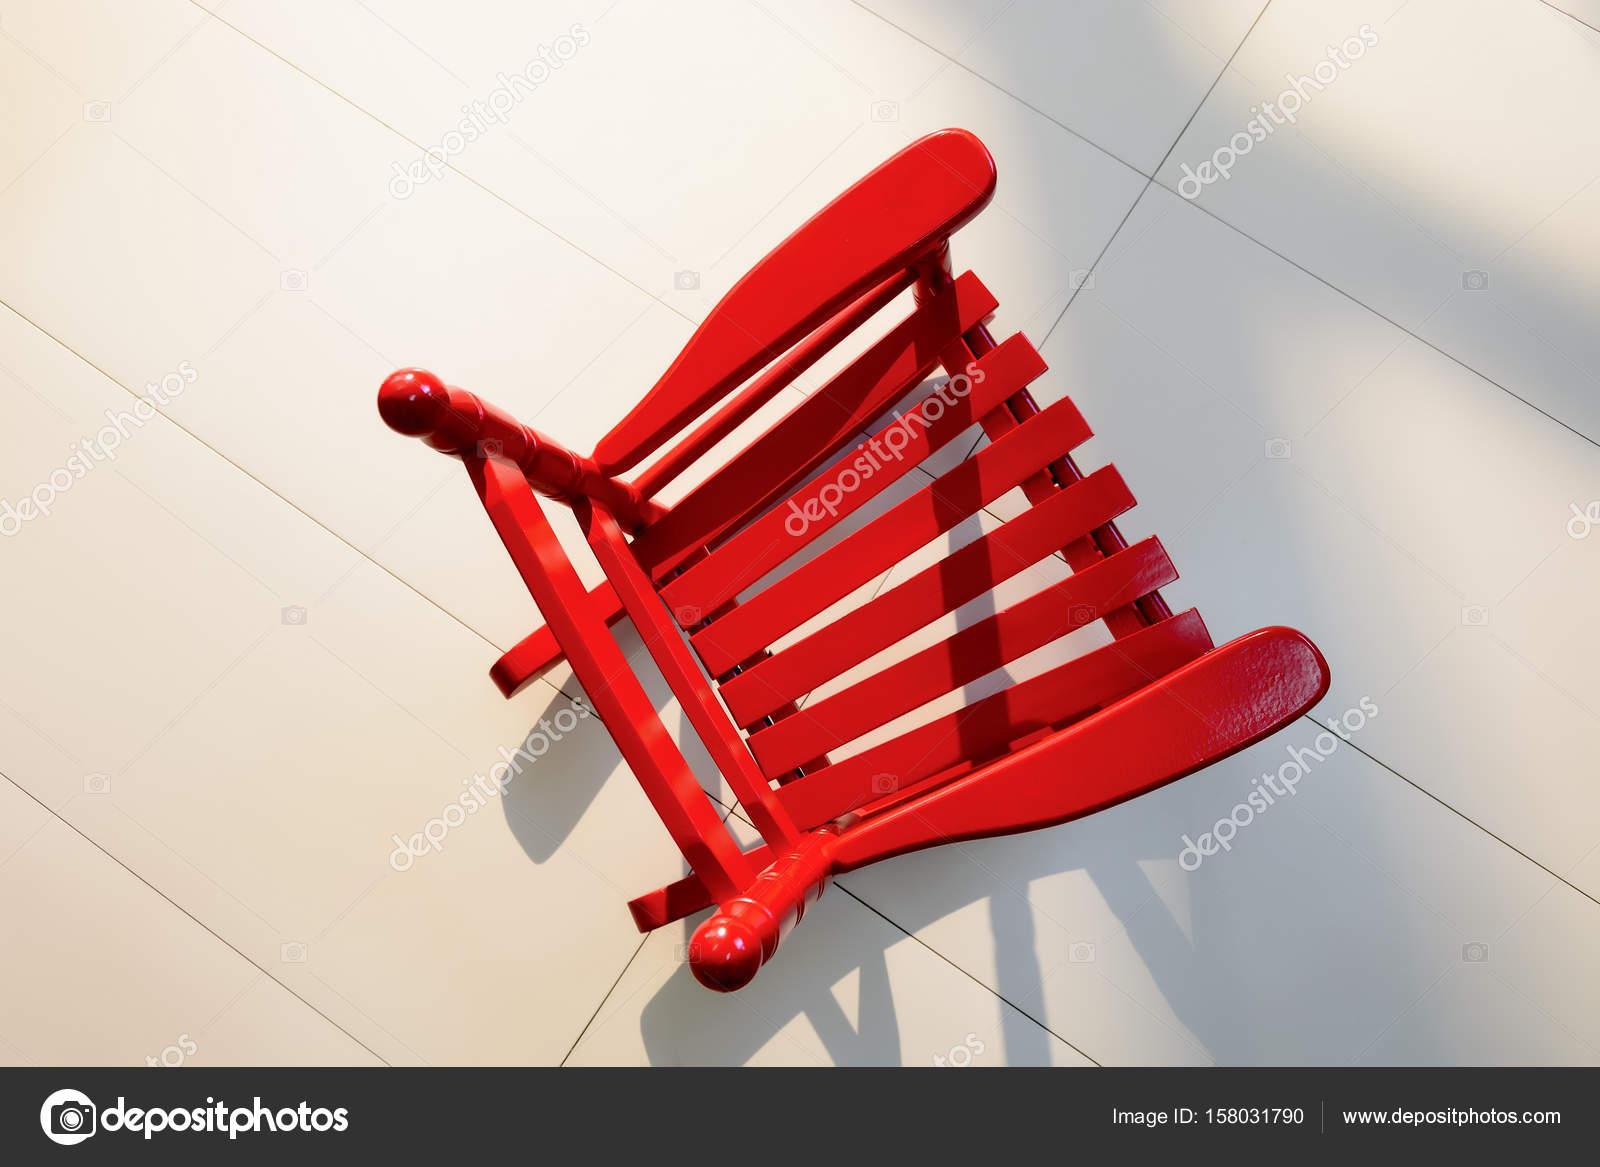 https://st3.depositphotos.com/1028559/15803/i/1600/depositphotos_158031790-stock-photo-red-school-chair.jpg